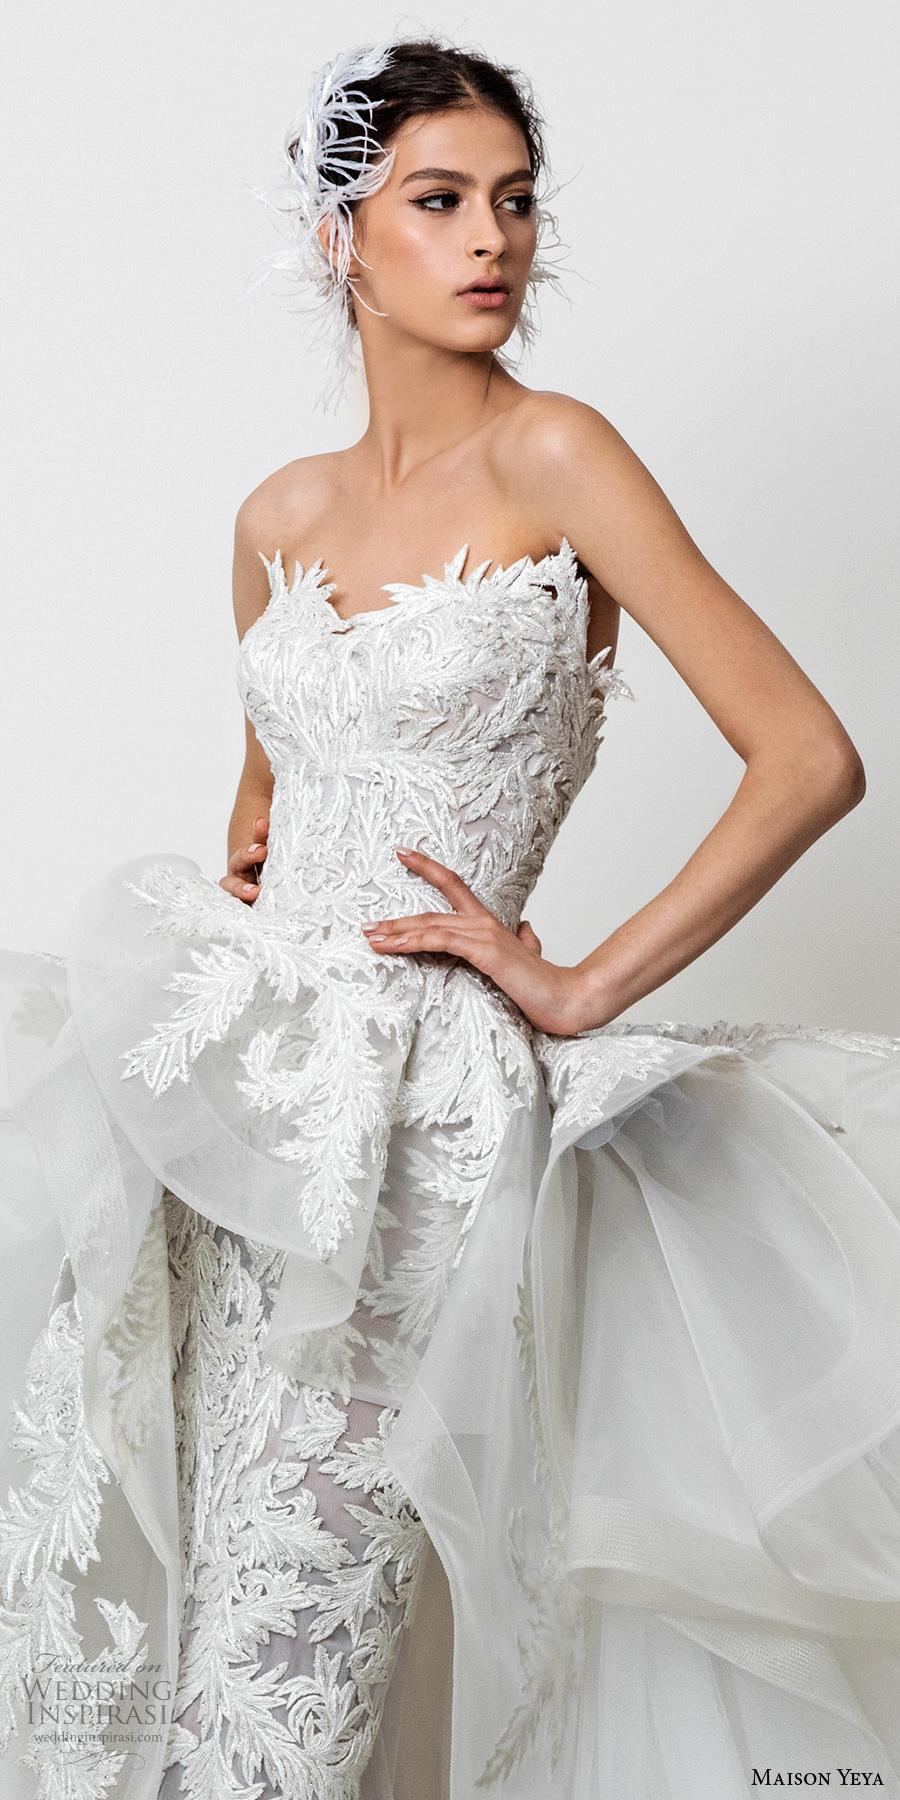 Maison Yeya 2017 Wedding Dresses Les R 233 Fugi 233 S D Amour